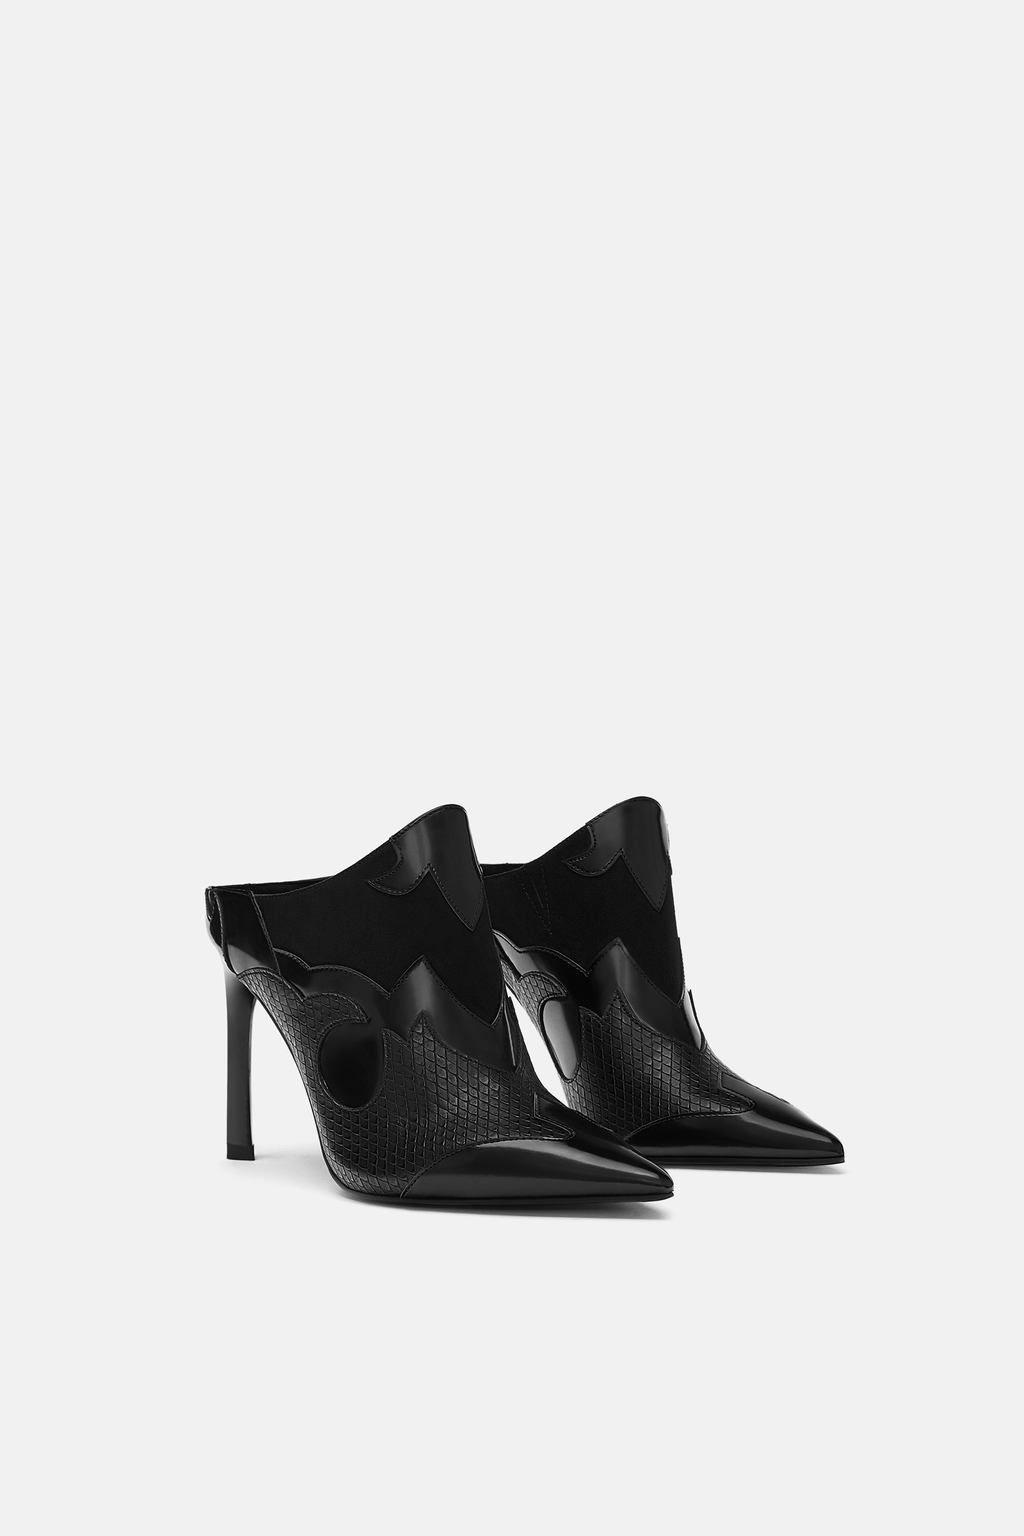 4b2db7420a3 MULE COWBOY Elegante Schuhe Damen